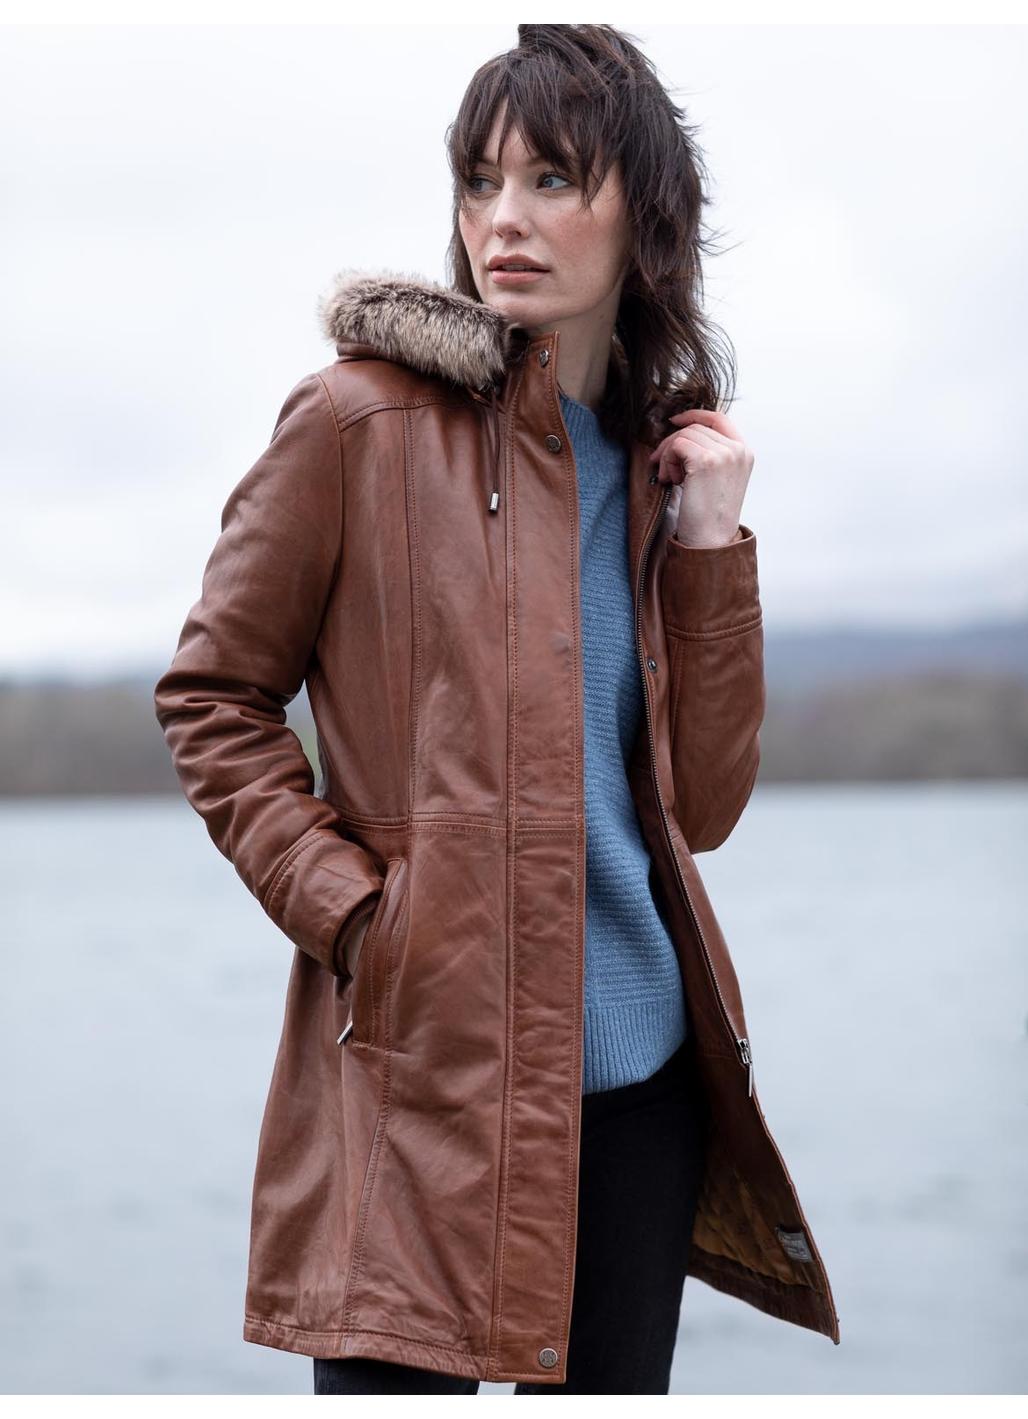 Ravensworth Long Leather Coat in Tan